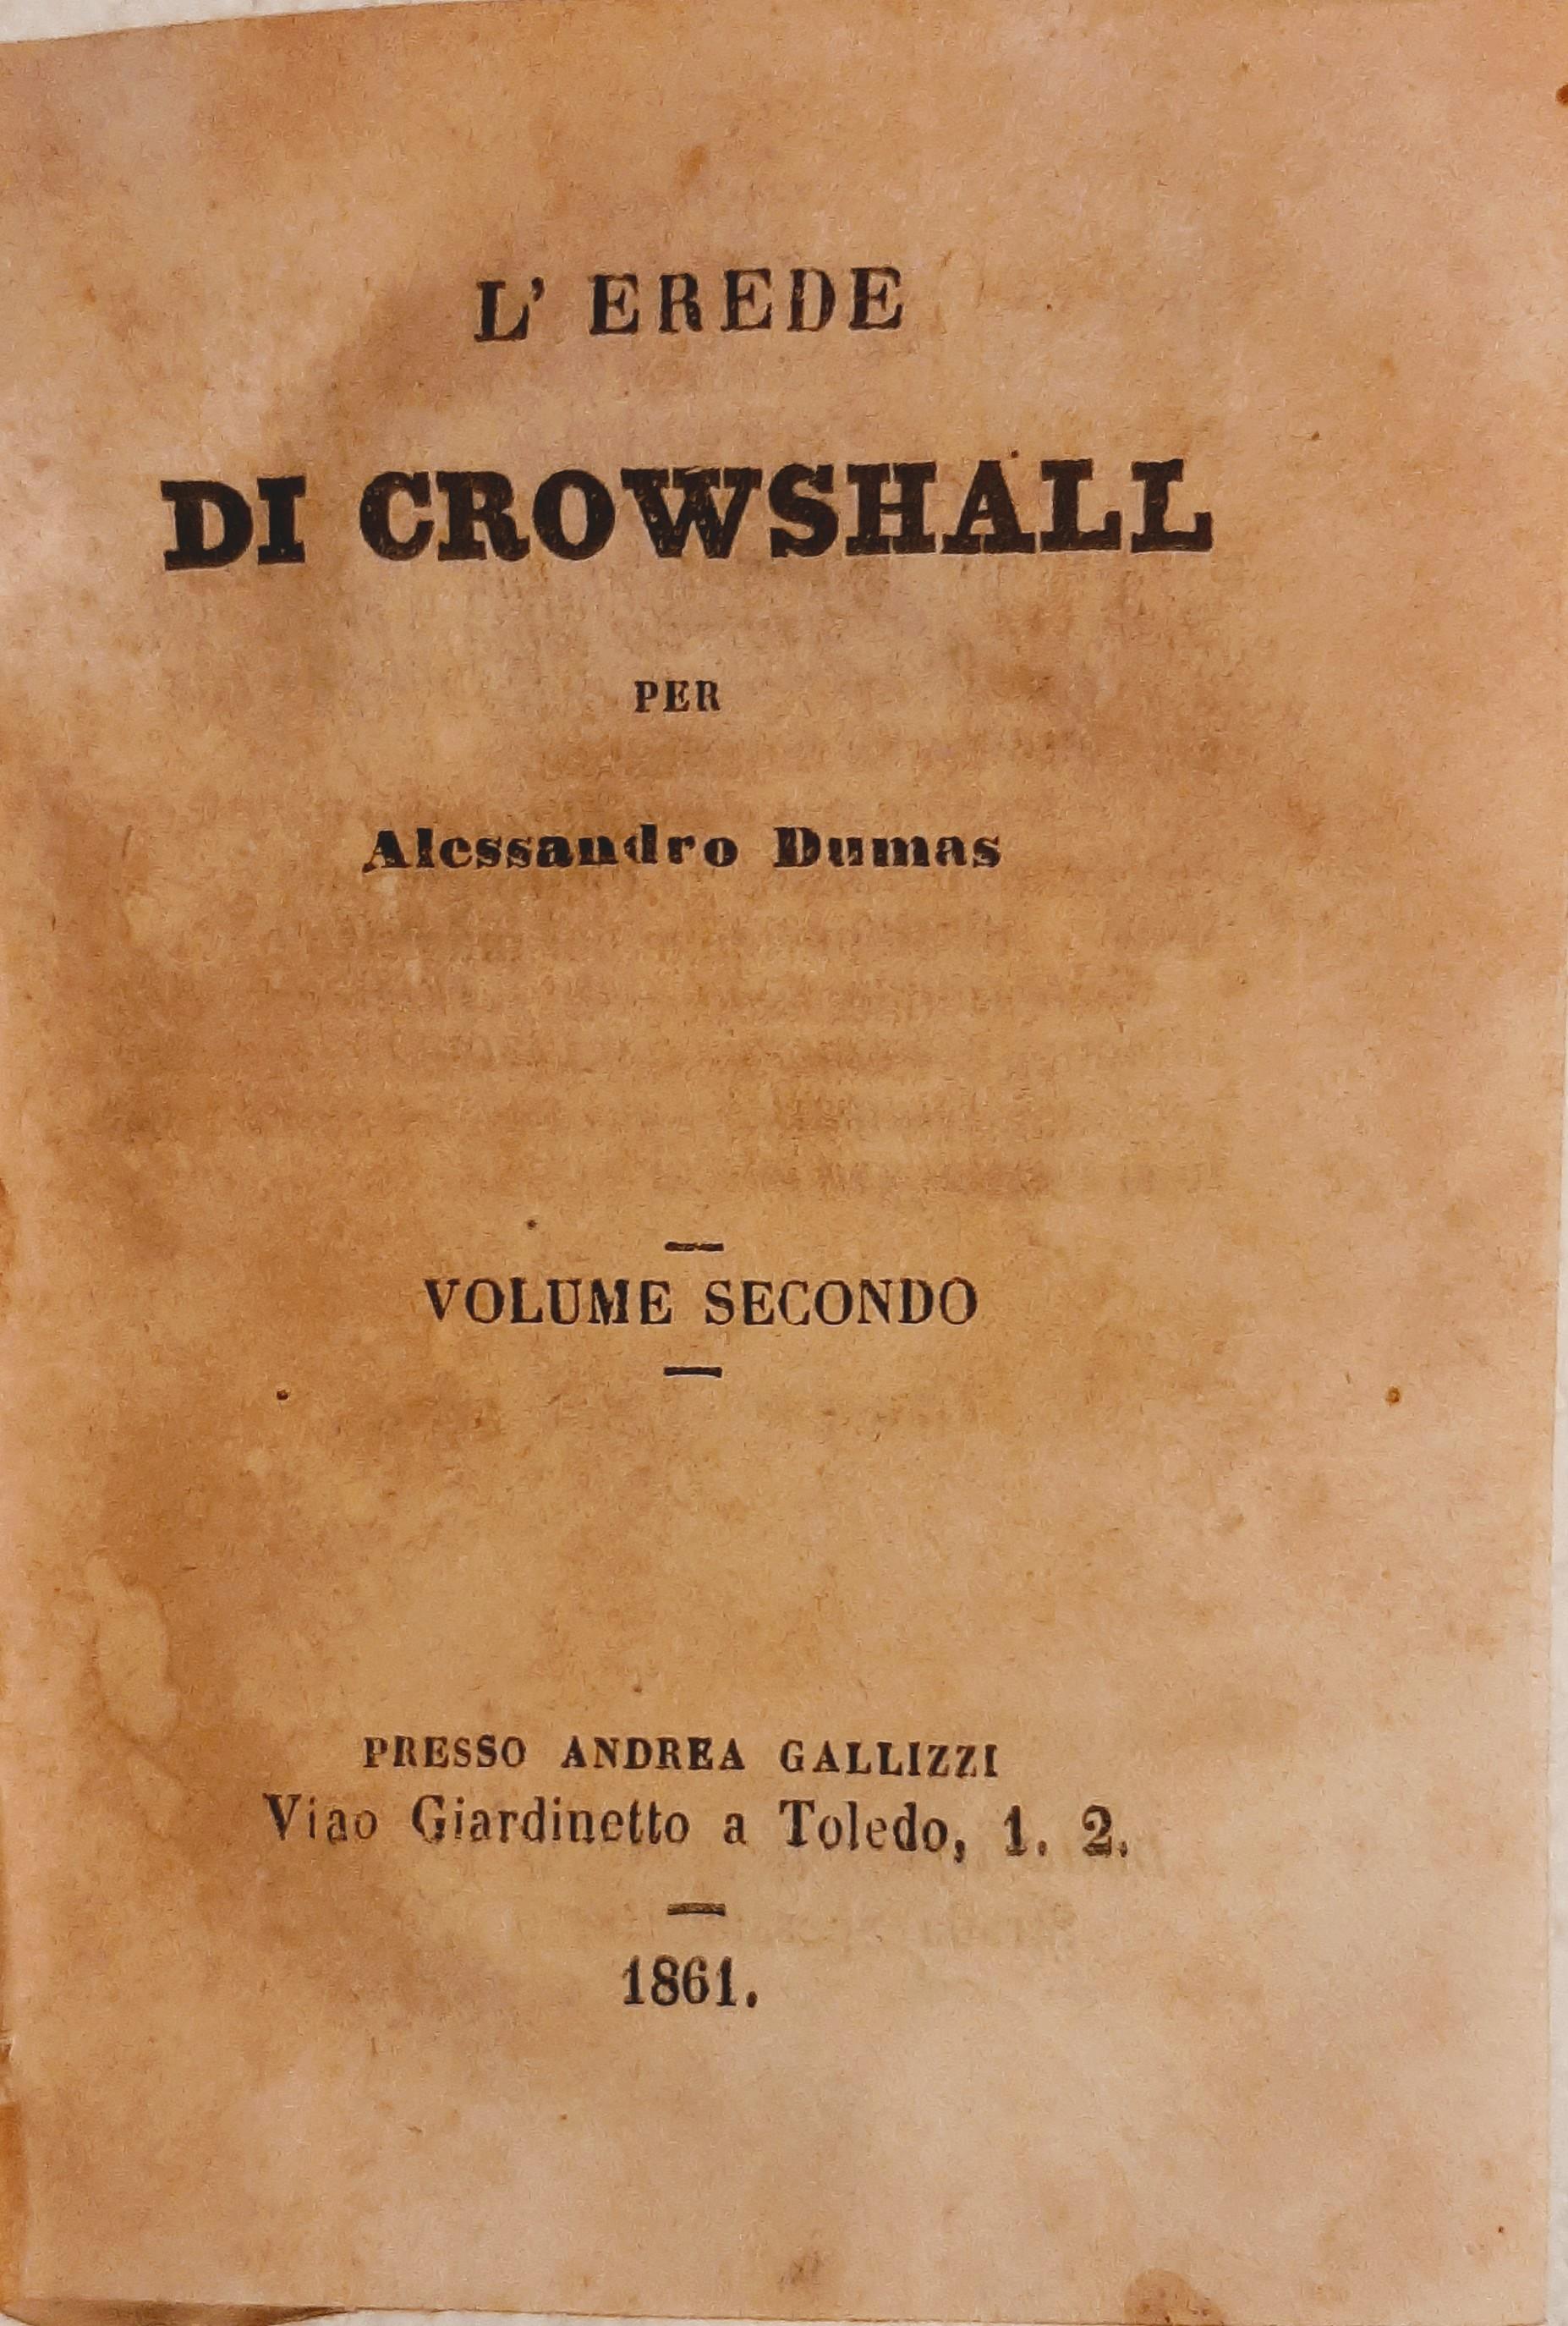 L'erede di Crowshall (vol. II)